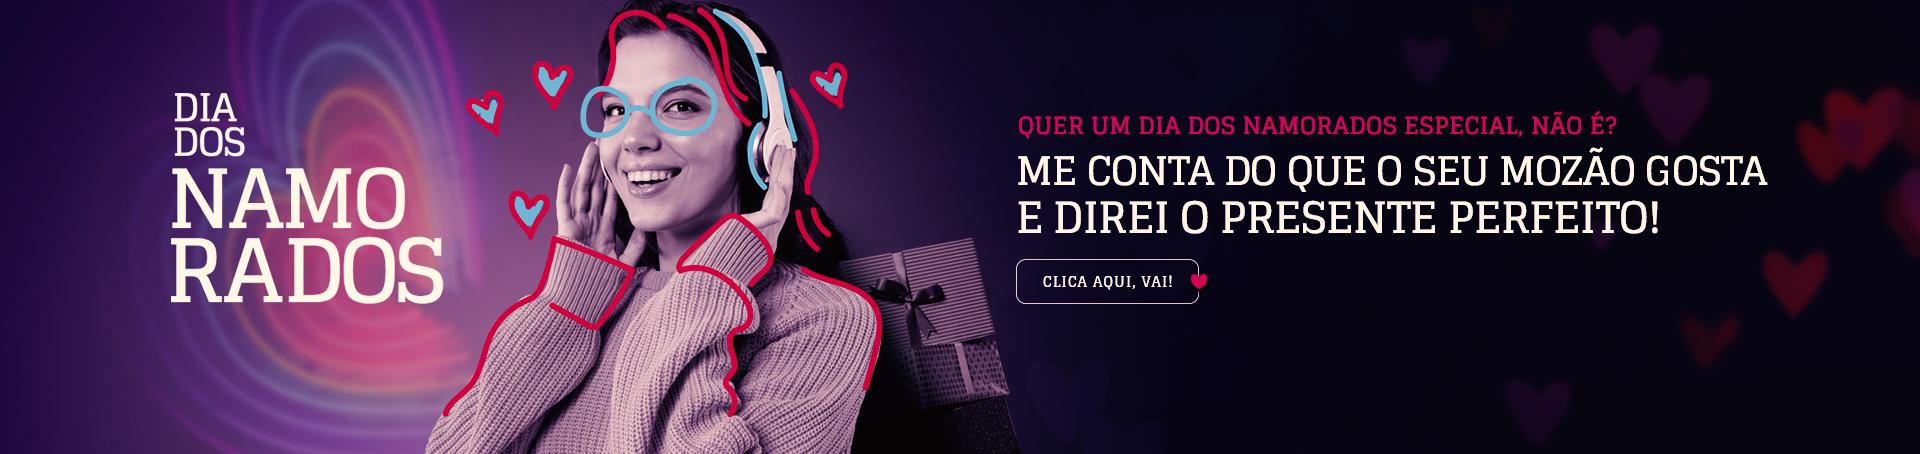 Dia dos Namorados - Chatbot